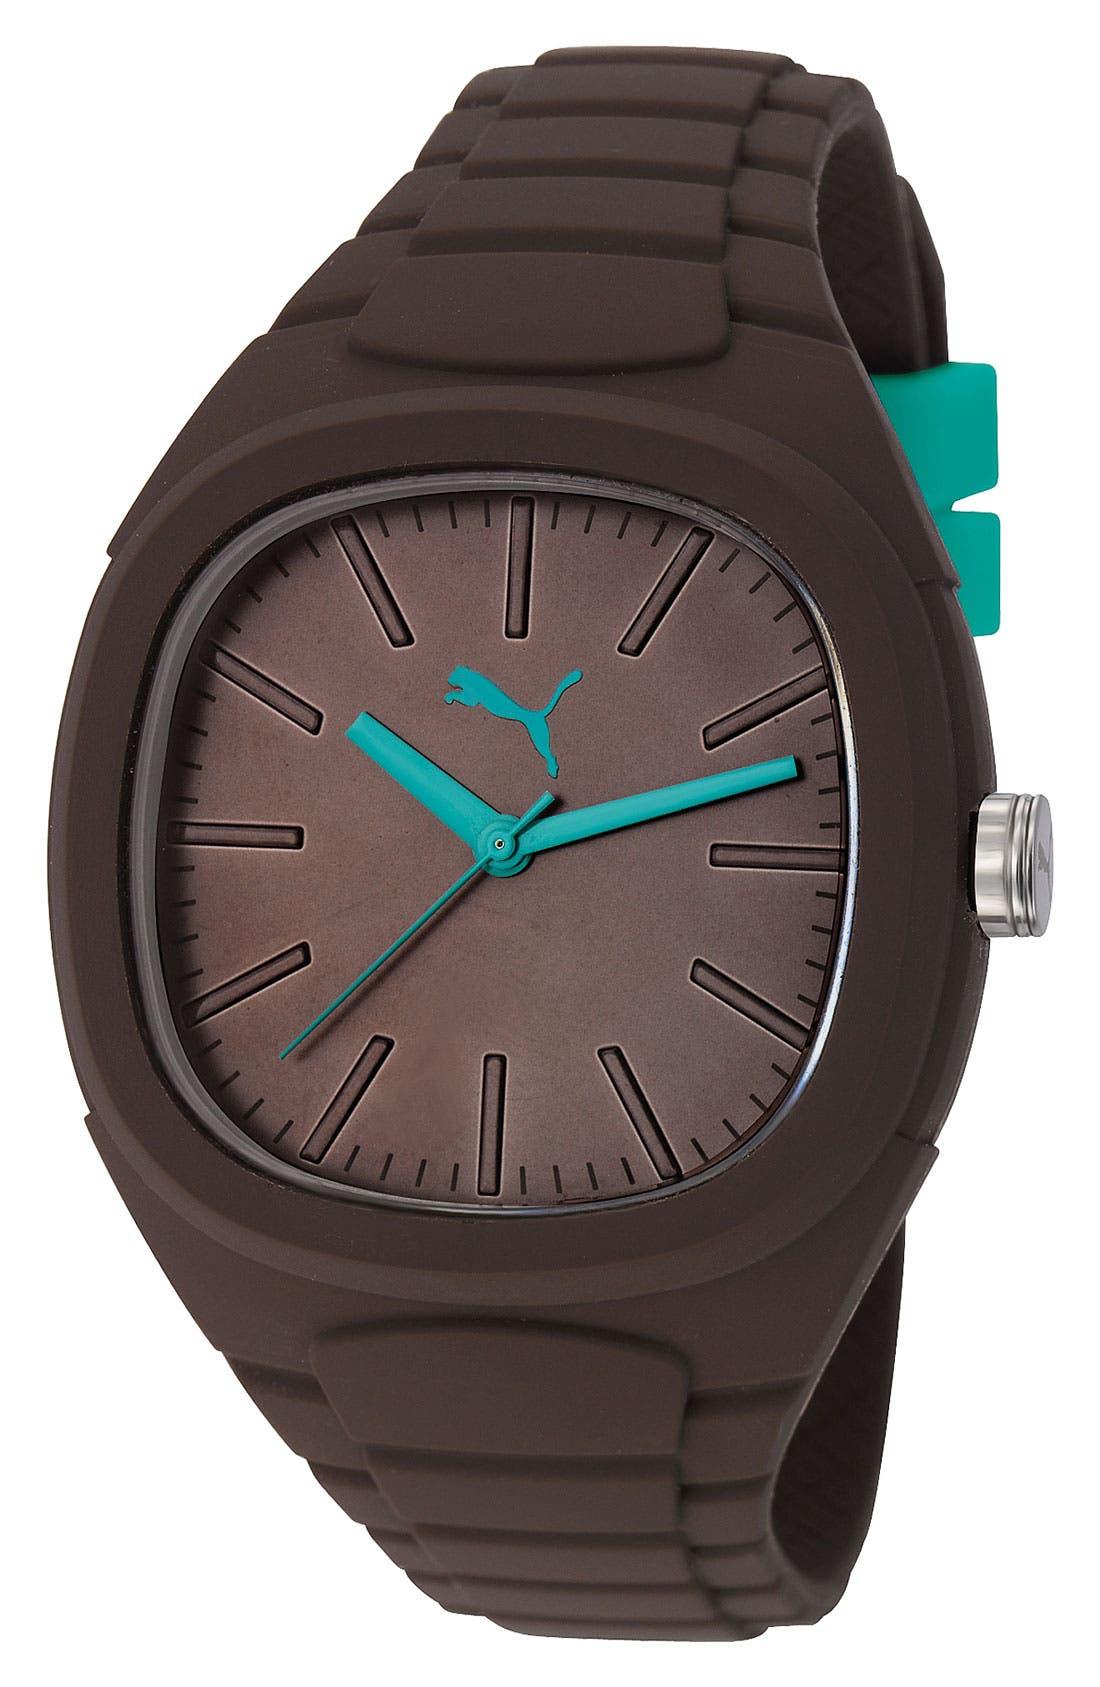 Main Image - PUMA 'Bubblegum - Large' Silicone Watch, 40mm x 44mm